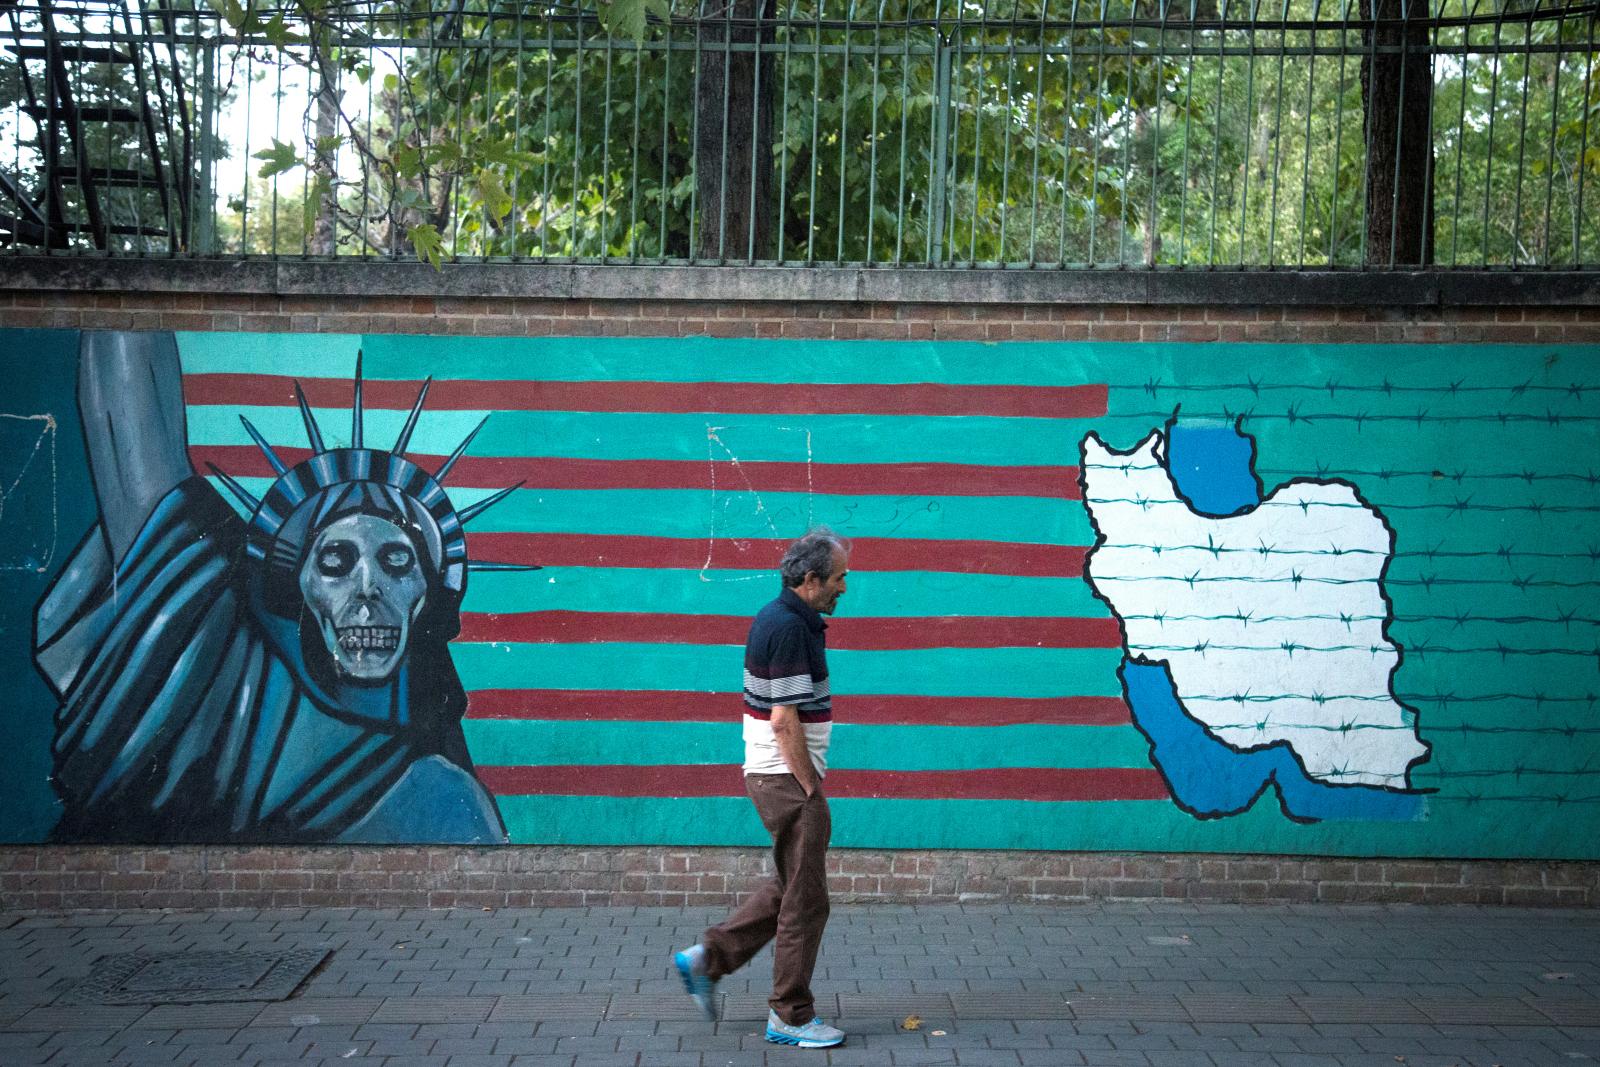 Iran trade sanctions